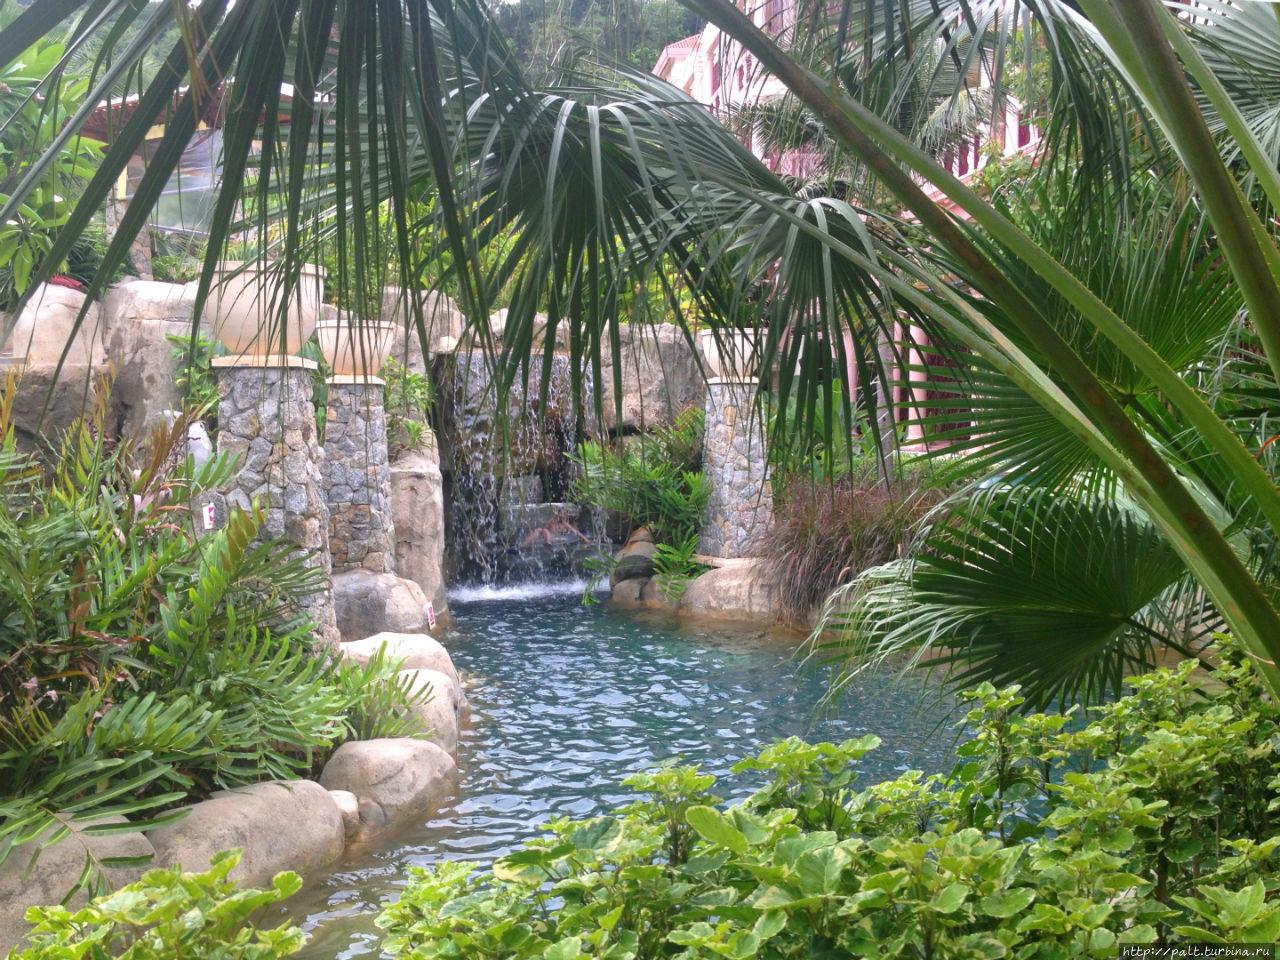 Ландшафтный аквапарк отел